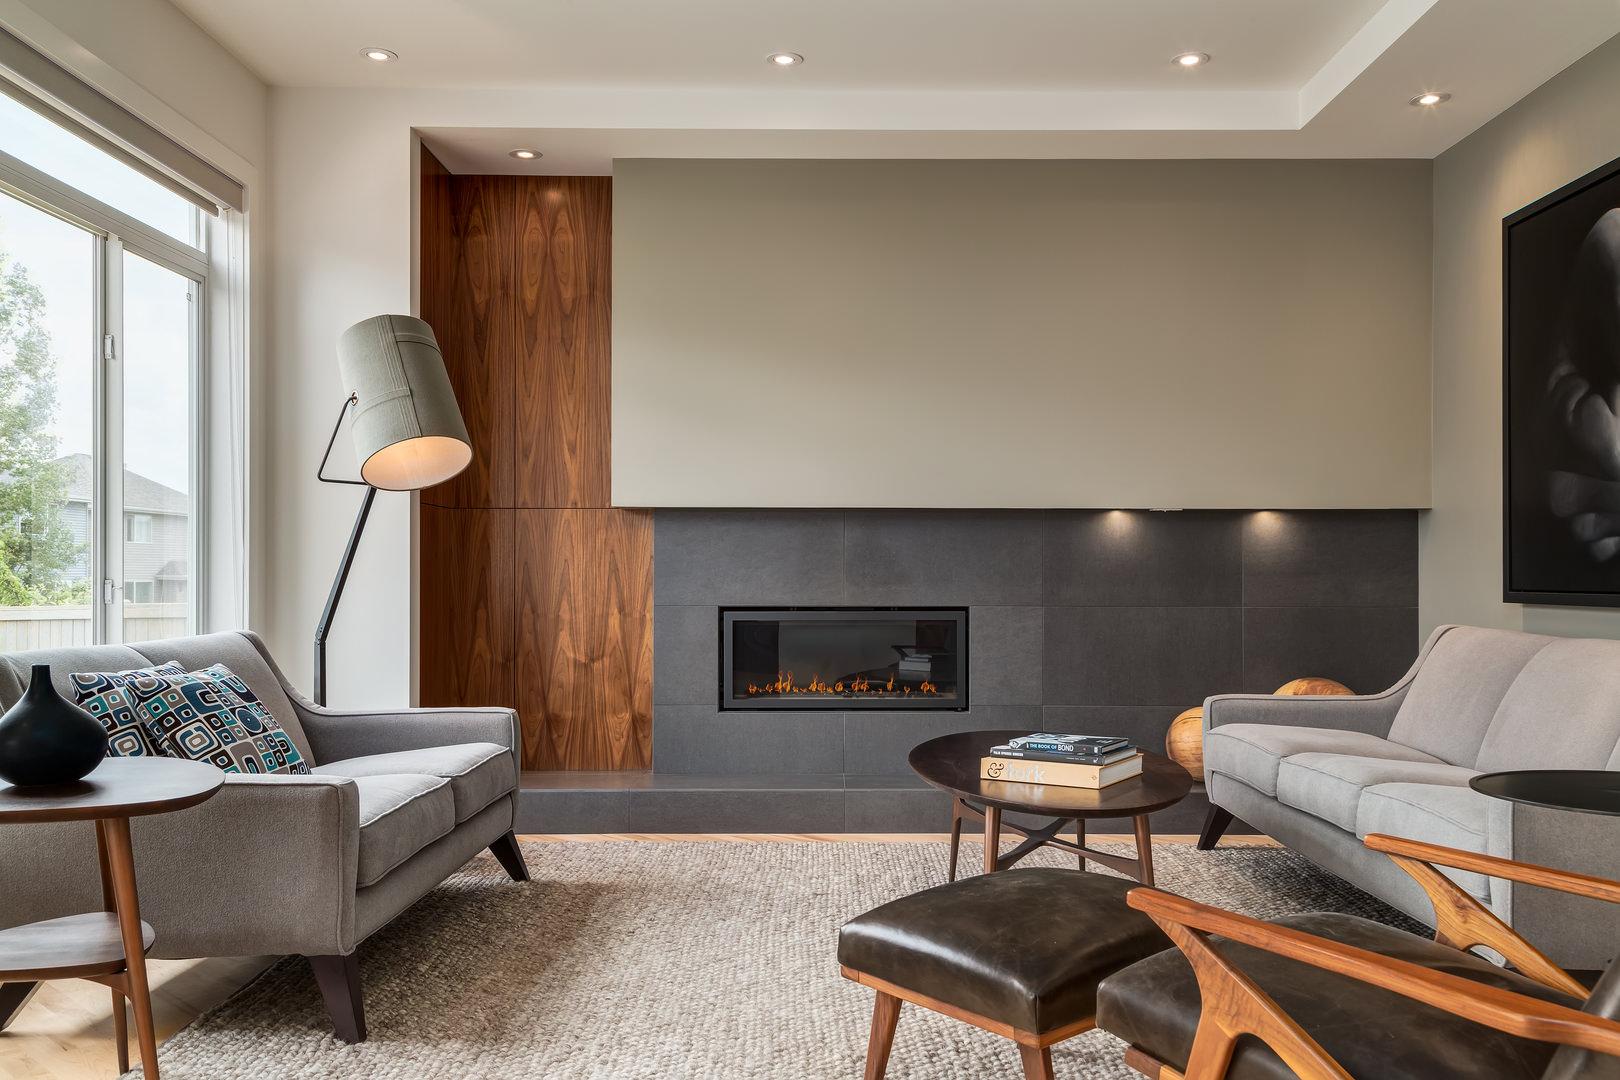 Contemporary Interior Design With Extensive Walnut Millwork